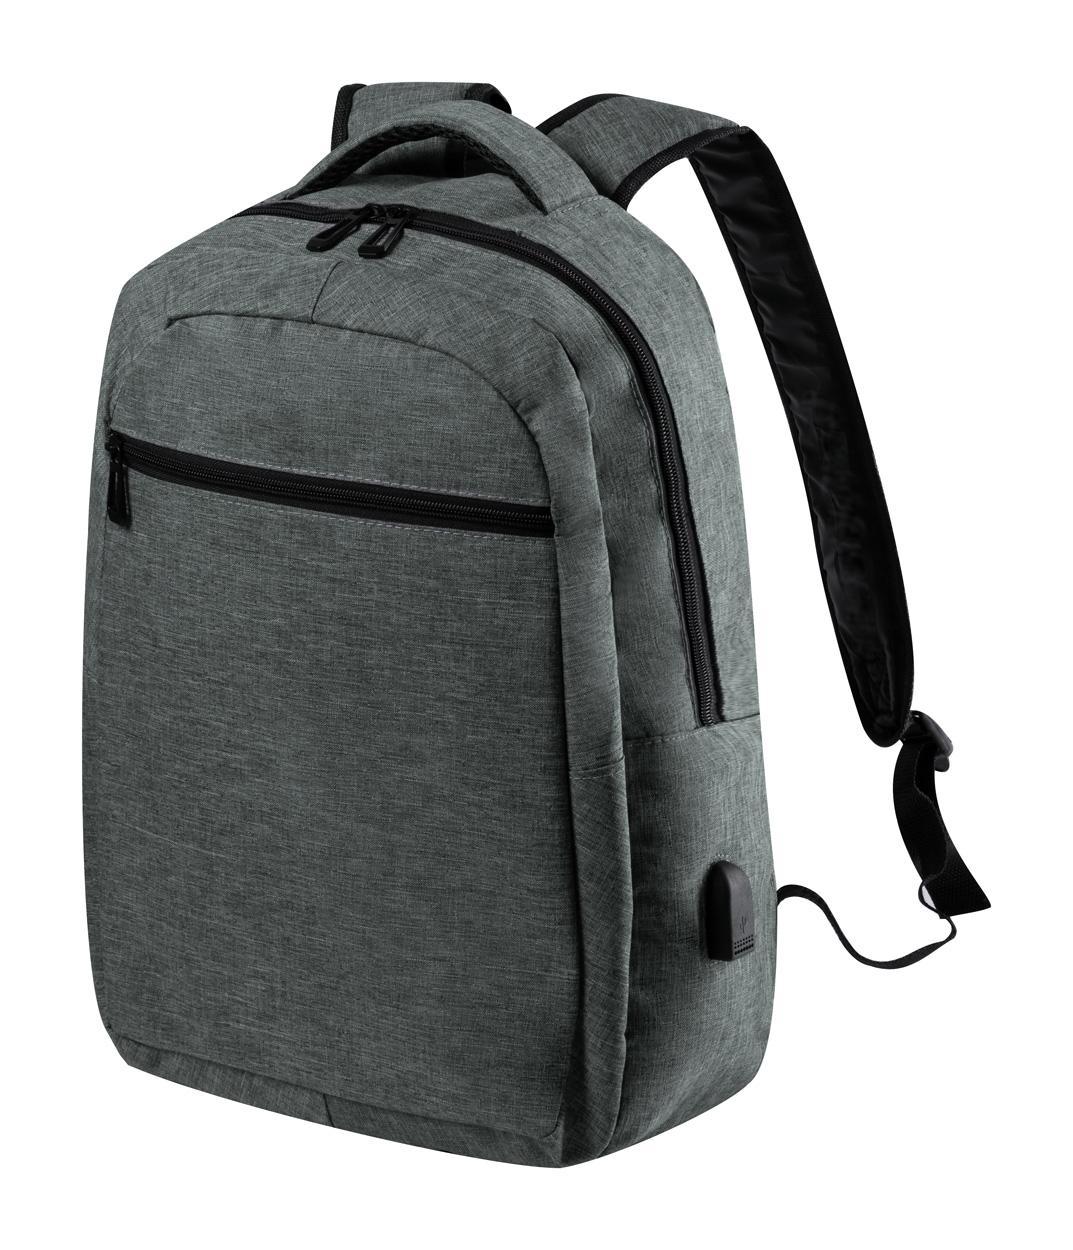 Mispat backpack